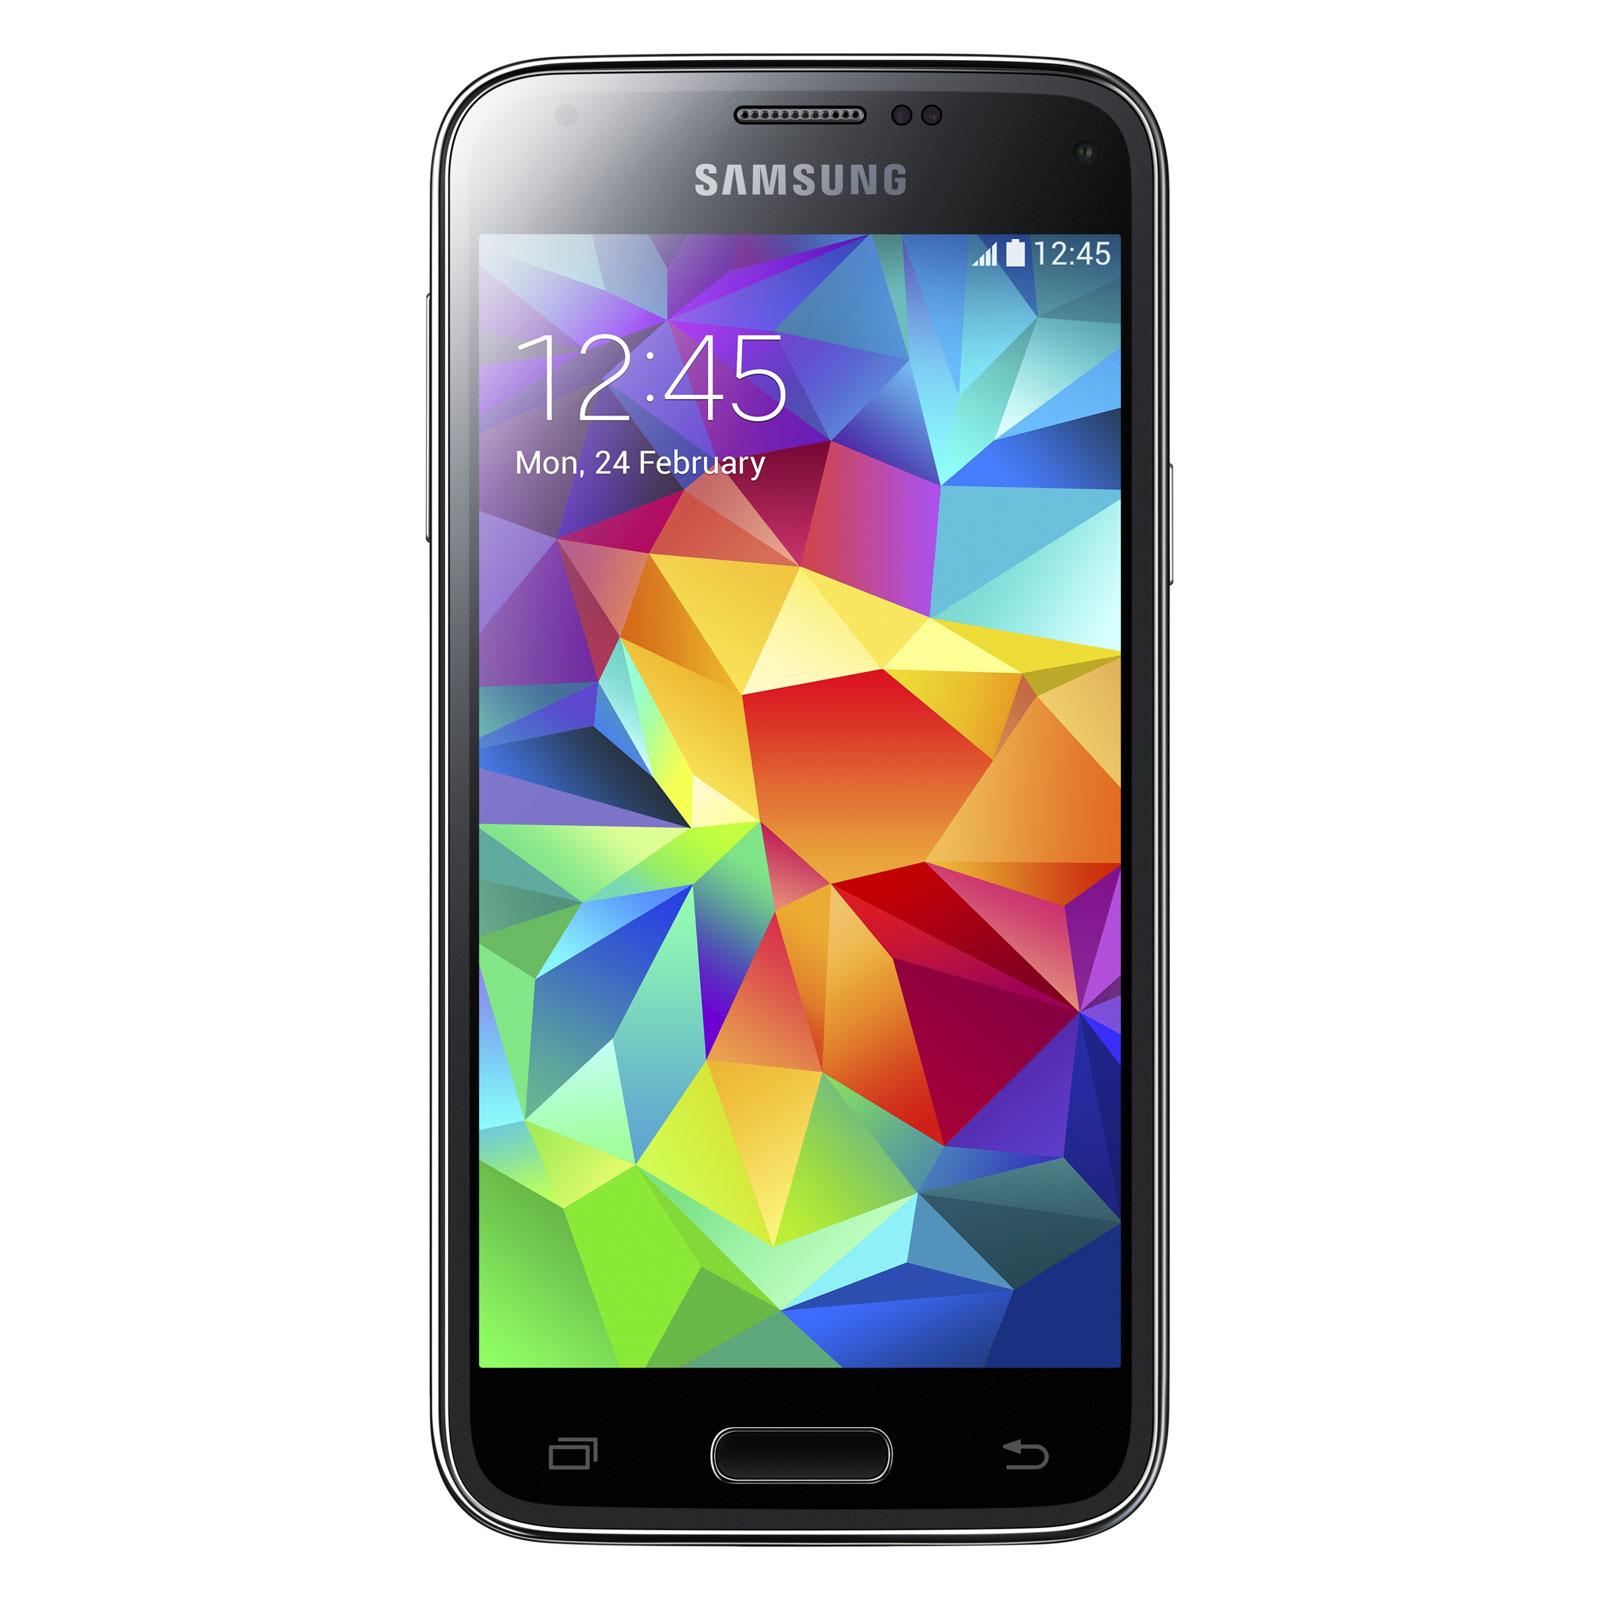 samsung galaxy s5 mini sm g800 noir 16 go mobile smartphone samsung sur. Black Bedroom Furniture Sets. Home Design Ideas